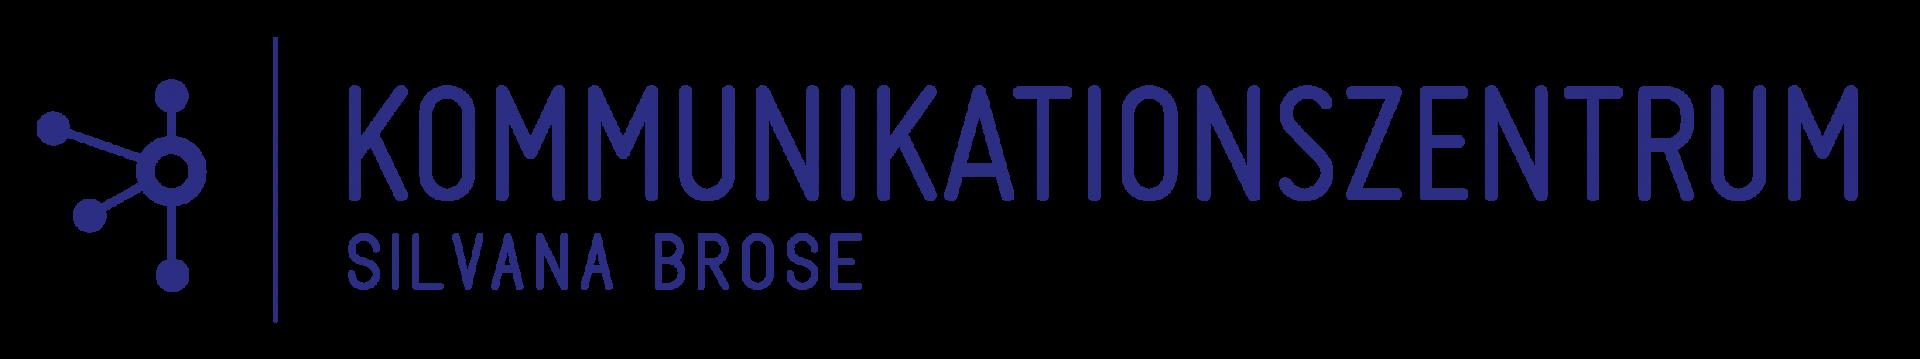 Logo Kommunikationszentrum